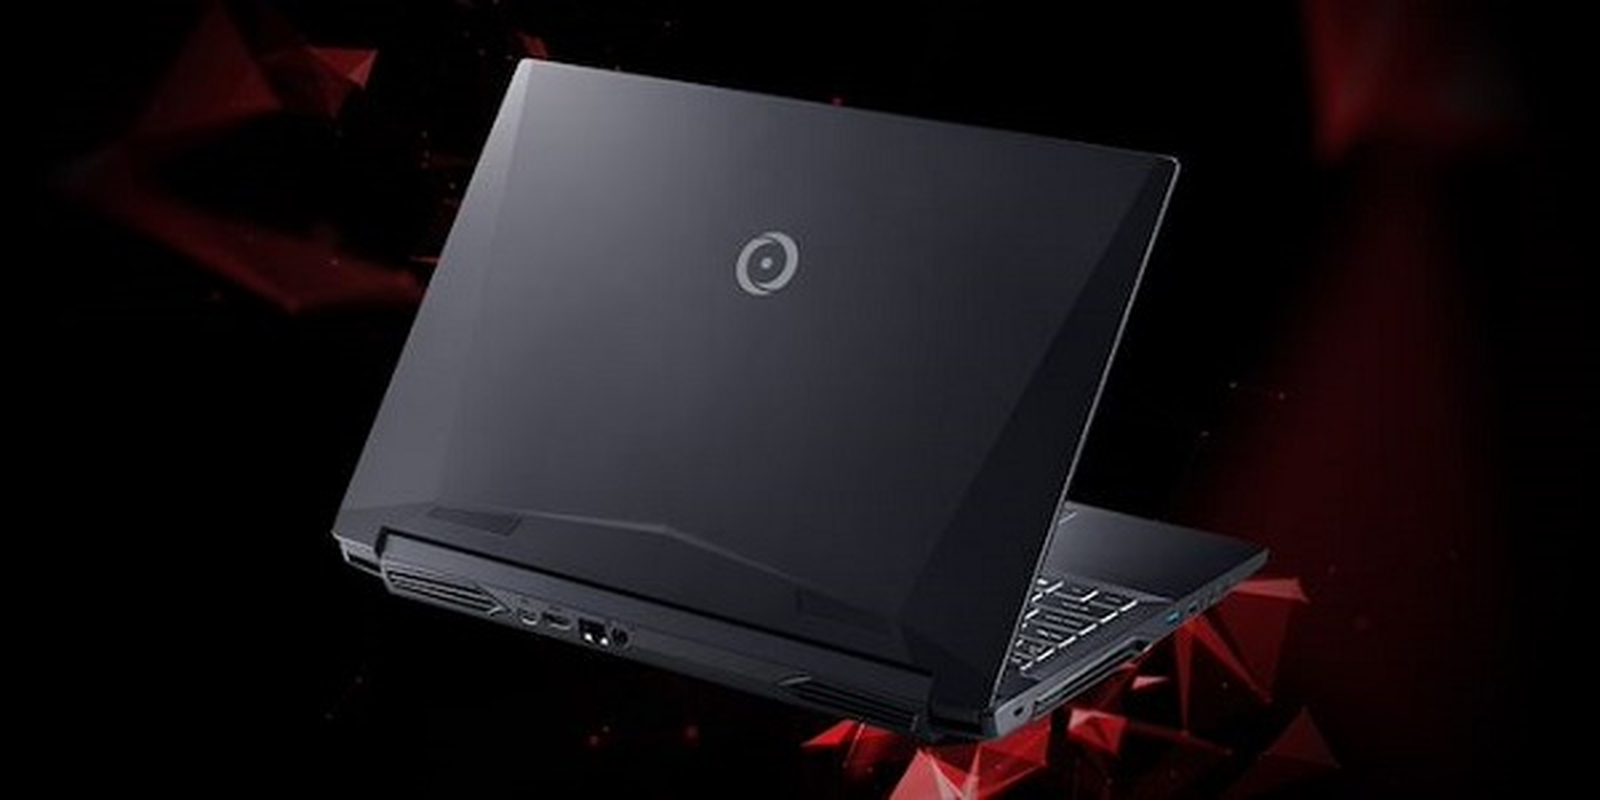 Sieu laptop manh nhat The gioi moi xuat hien, so huu CPU desktop